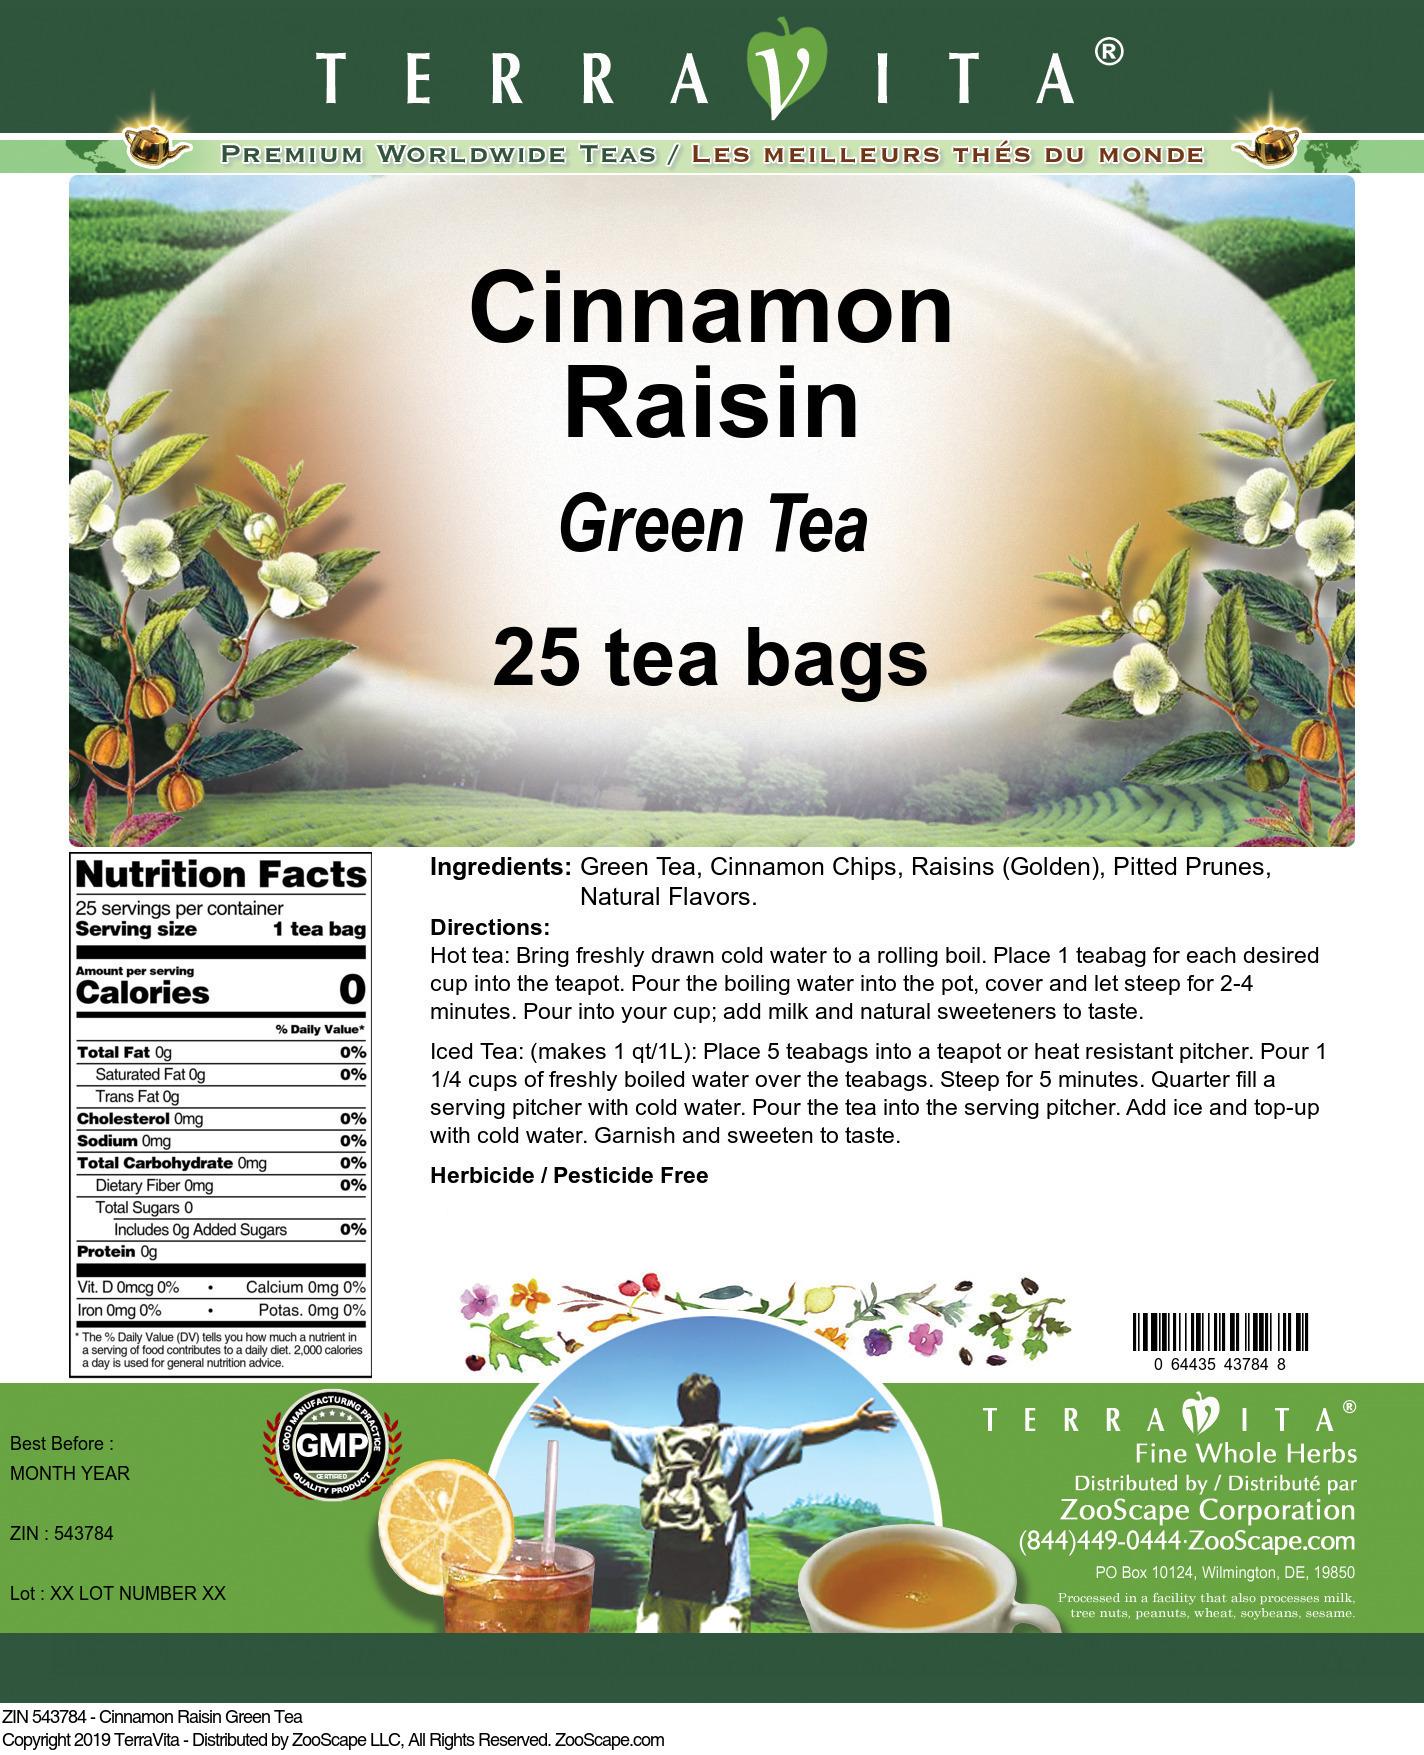 Cinnamon Raisin Green Tea